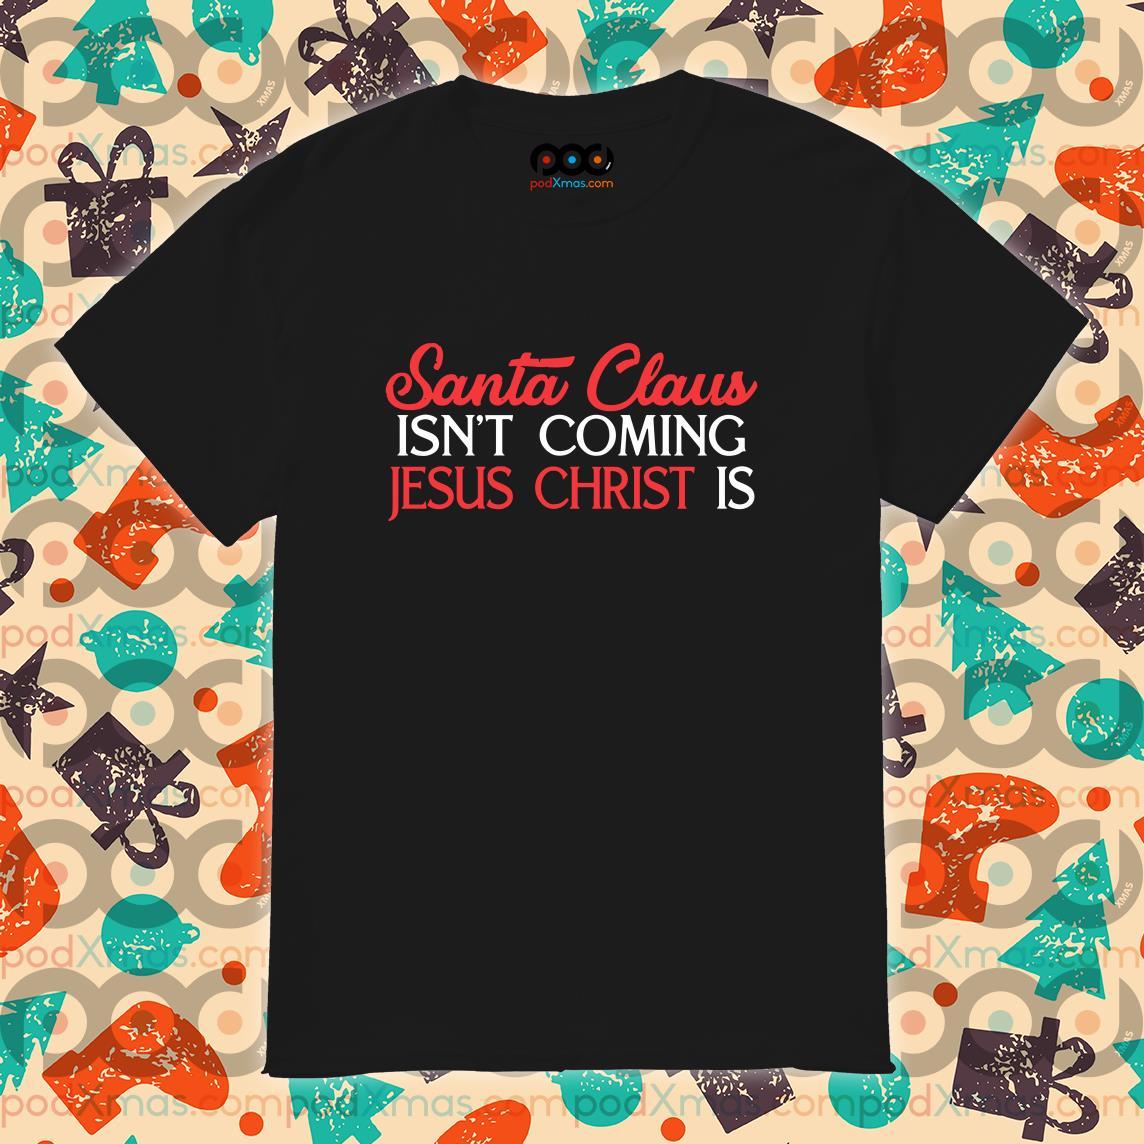 Santa Claus isn't coming Jesus Christ is Shirt